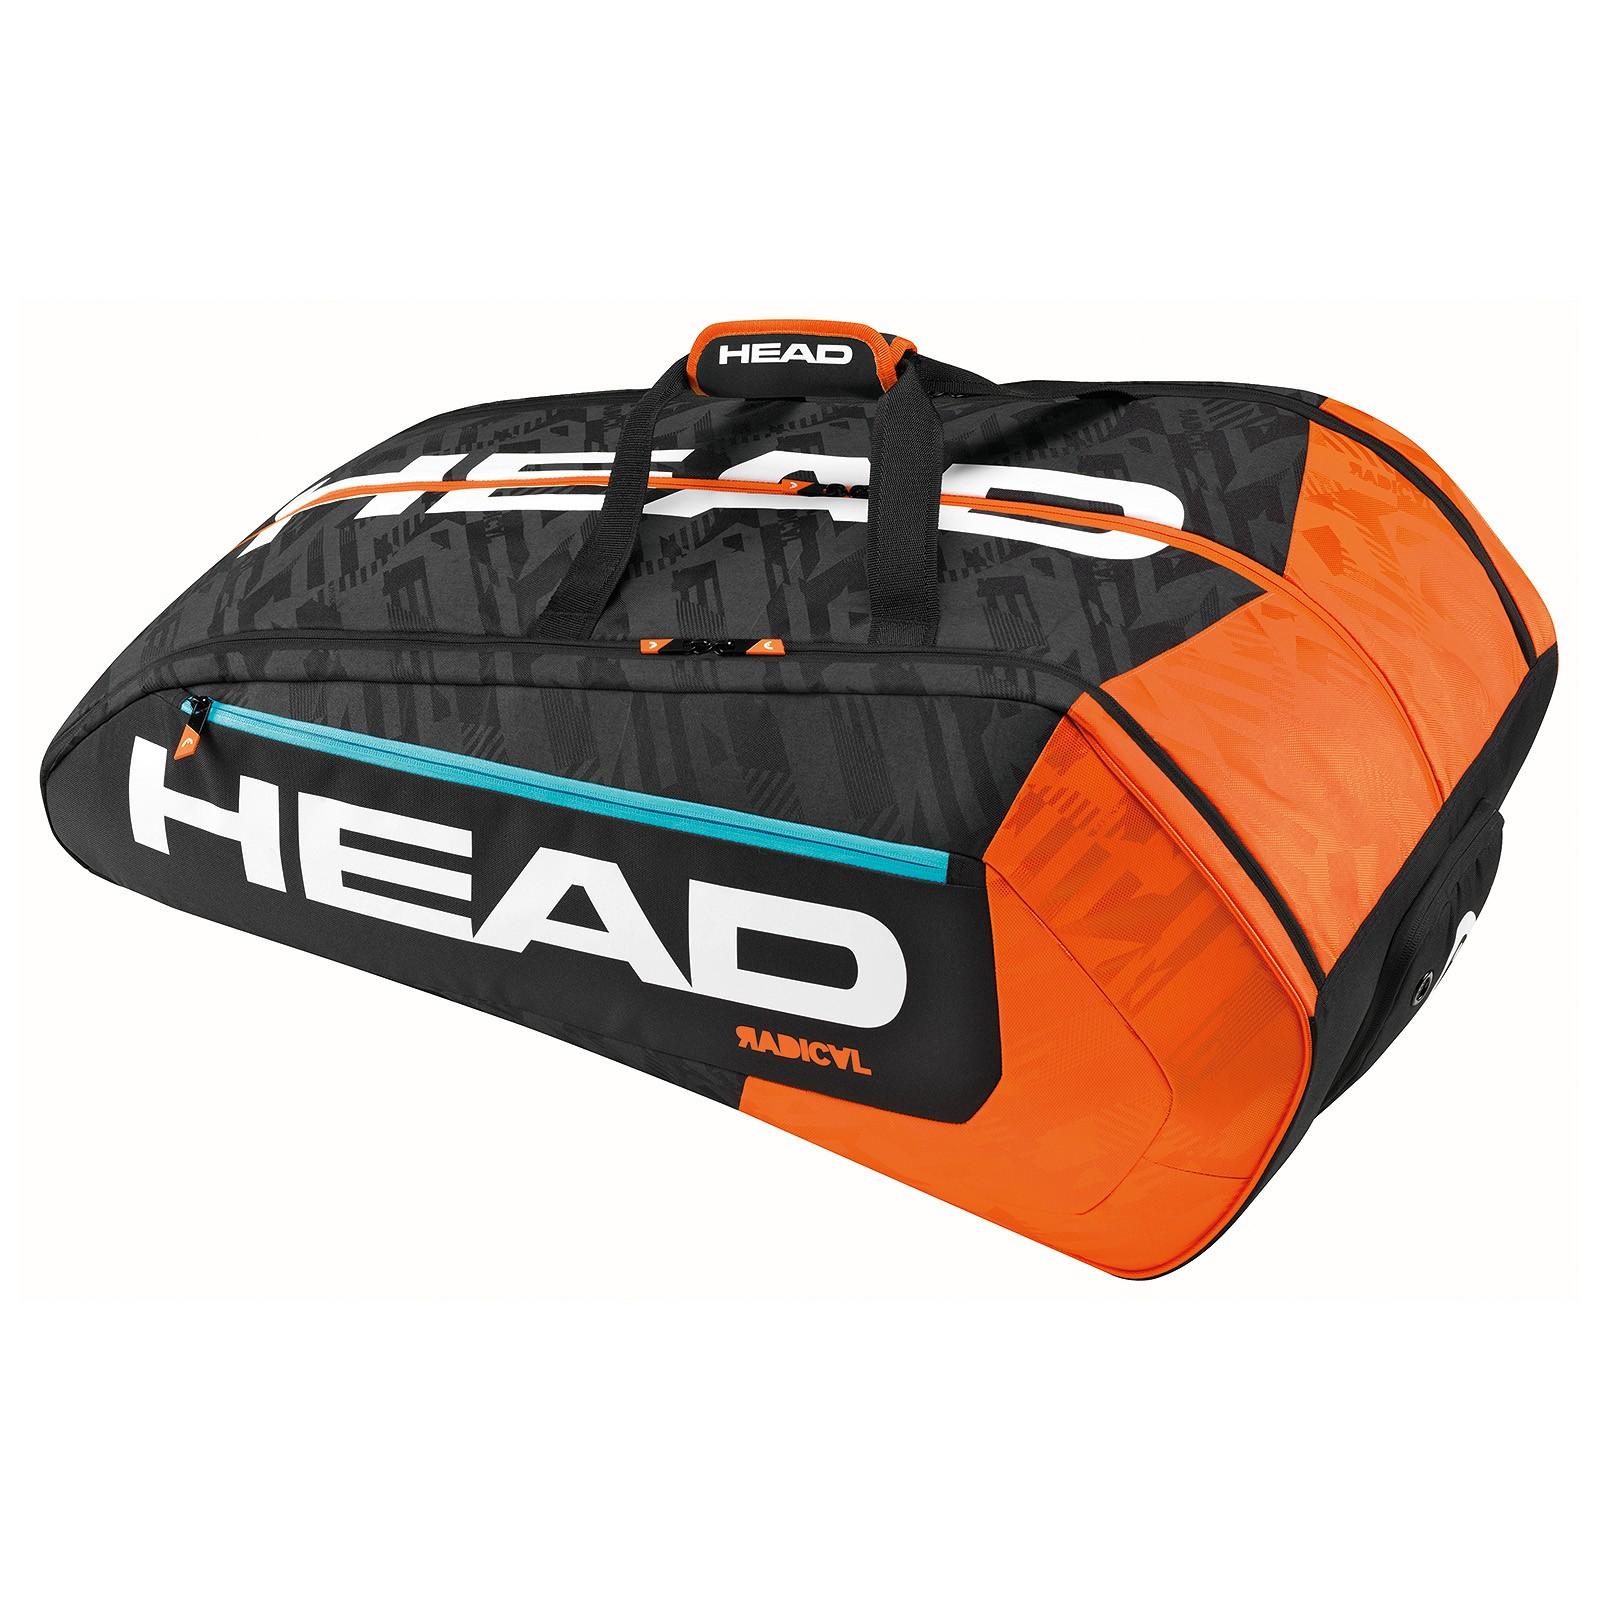 Torba tenisowa Head Radical 12R Monstercombi